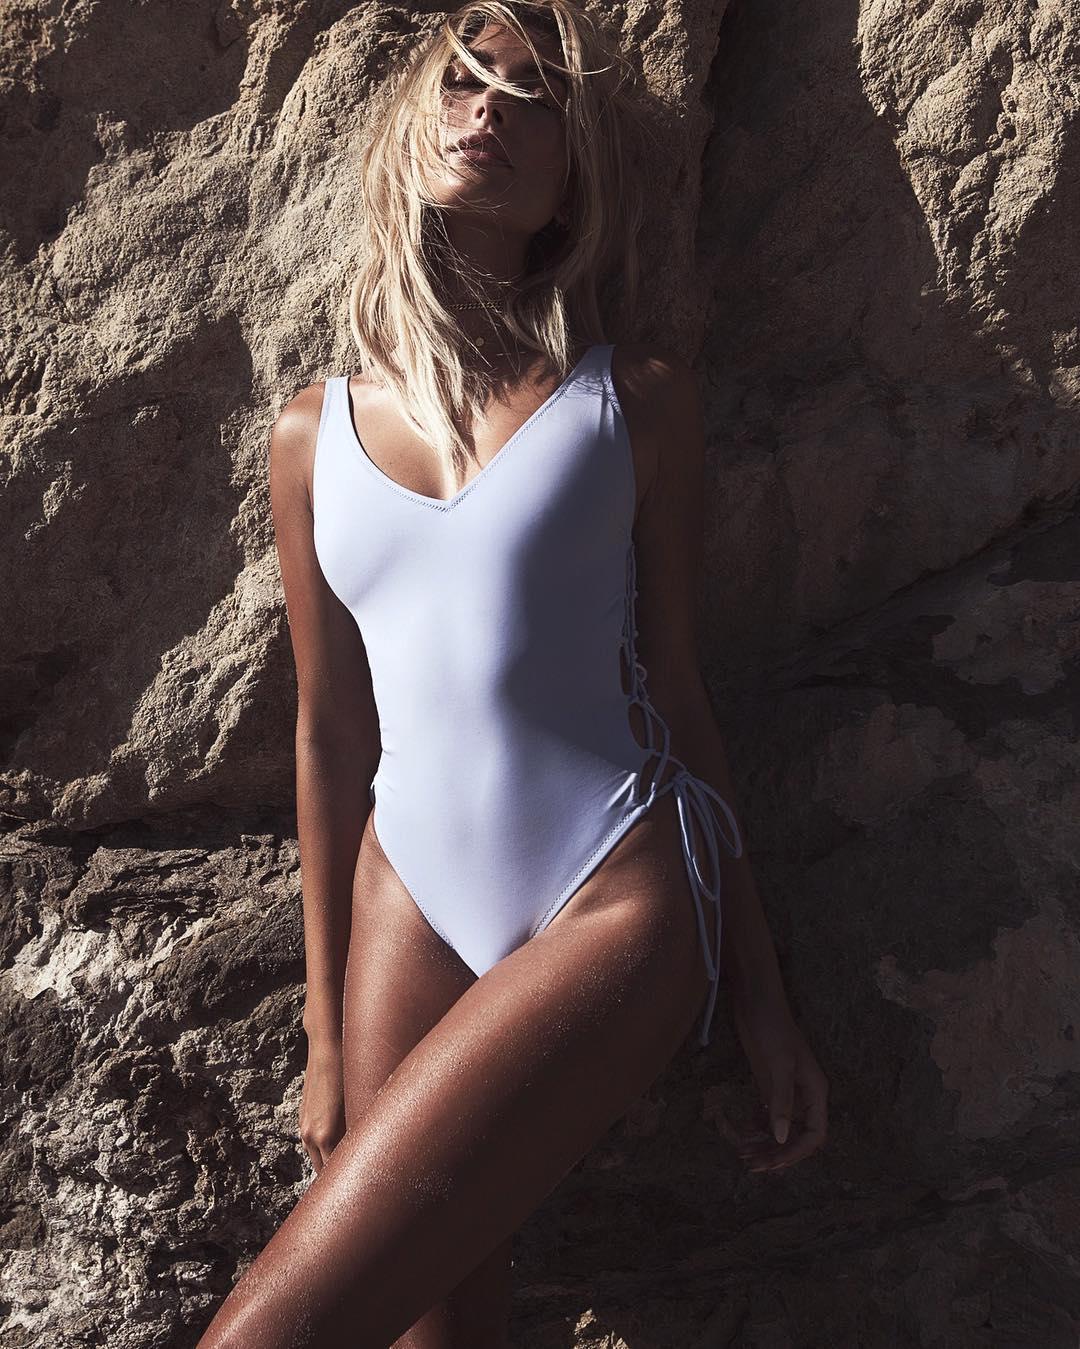 Модель Хэйли Болдуин в бикини